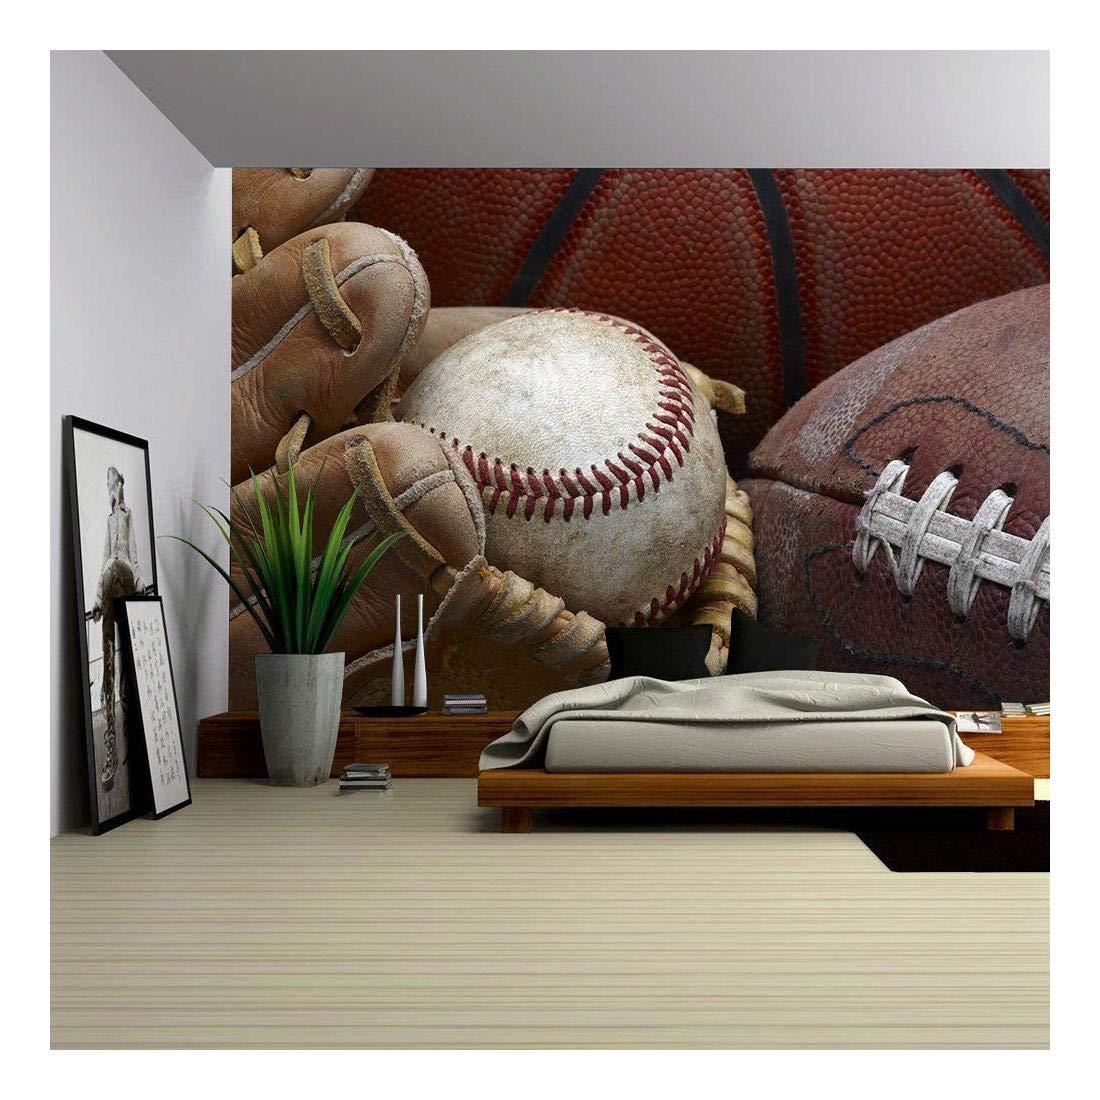 large sports murals amazon comwall26 close up shot of well worn baseball in baseball glove, football and basketball